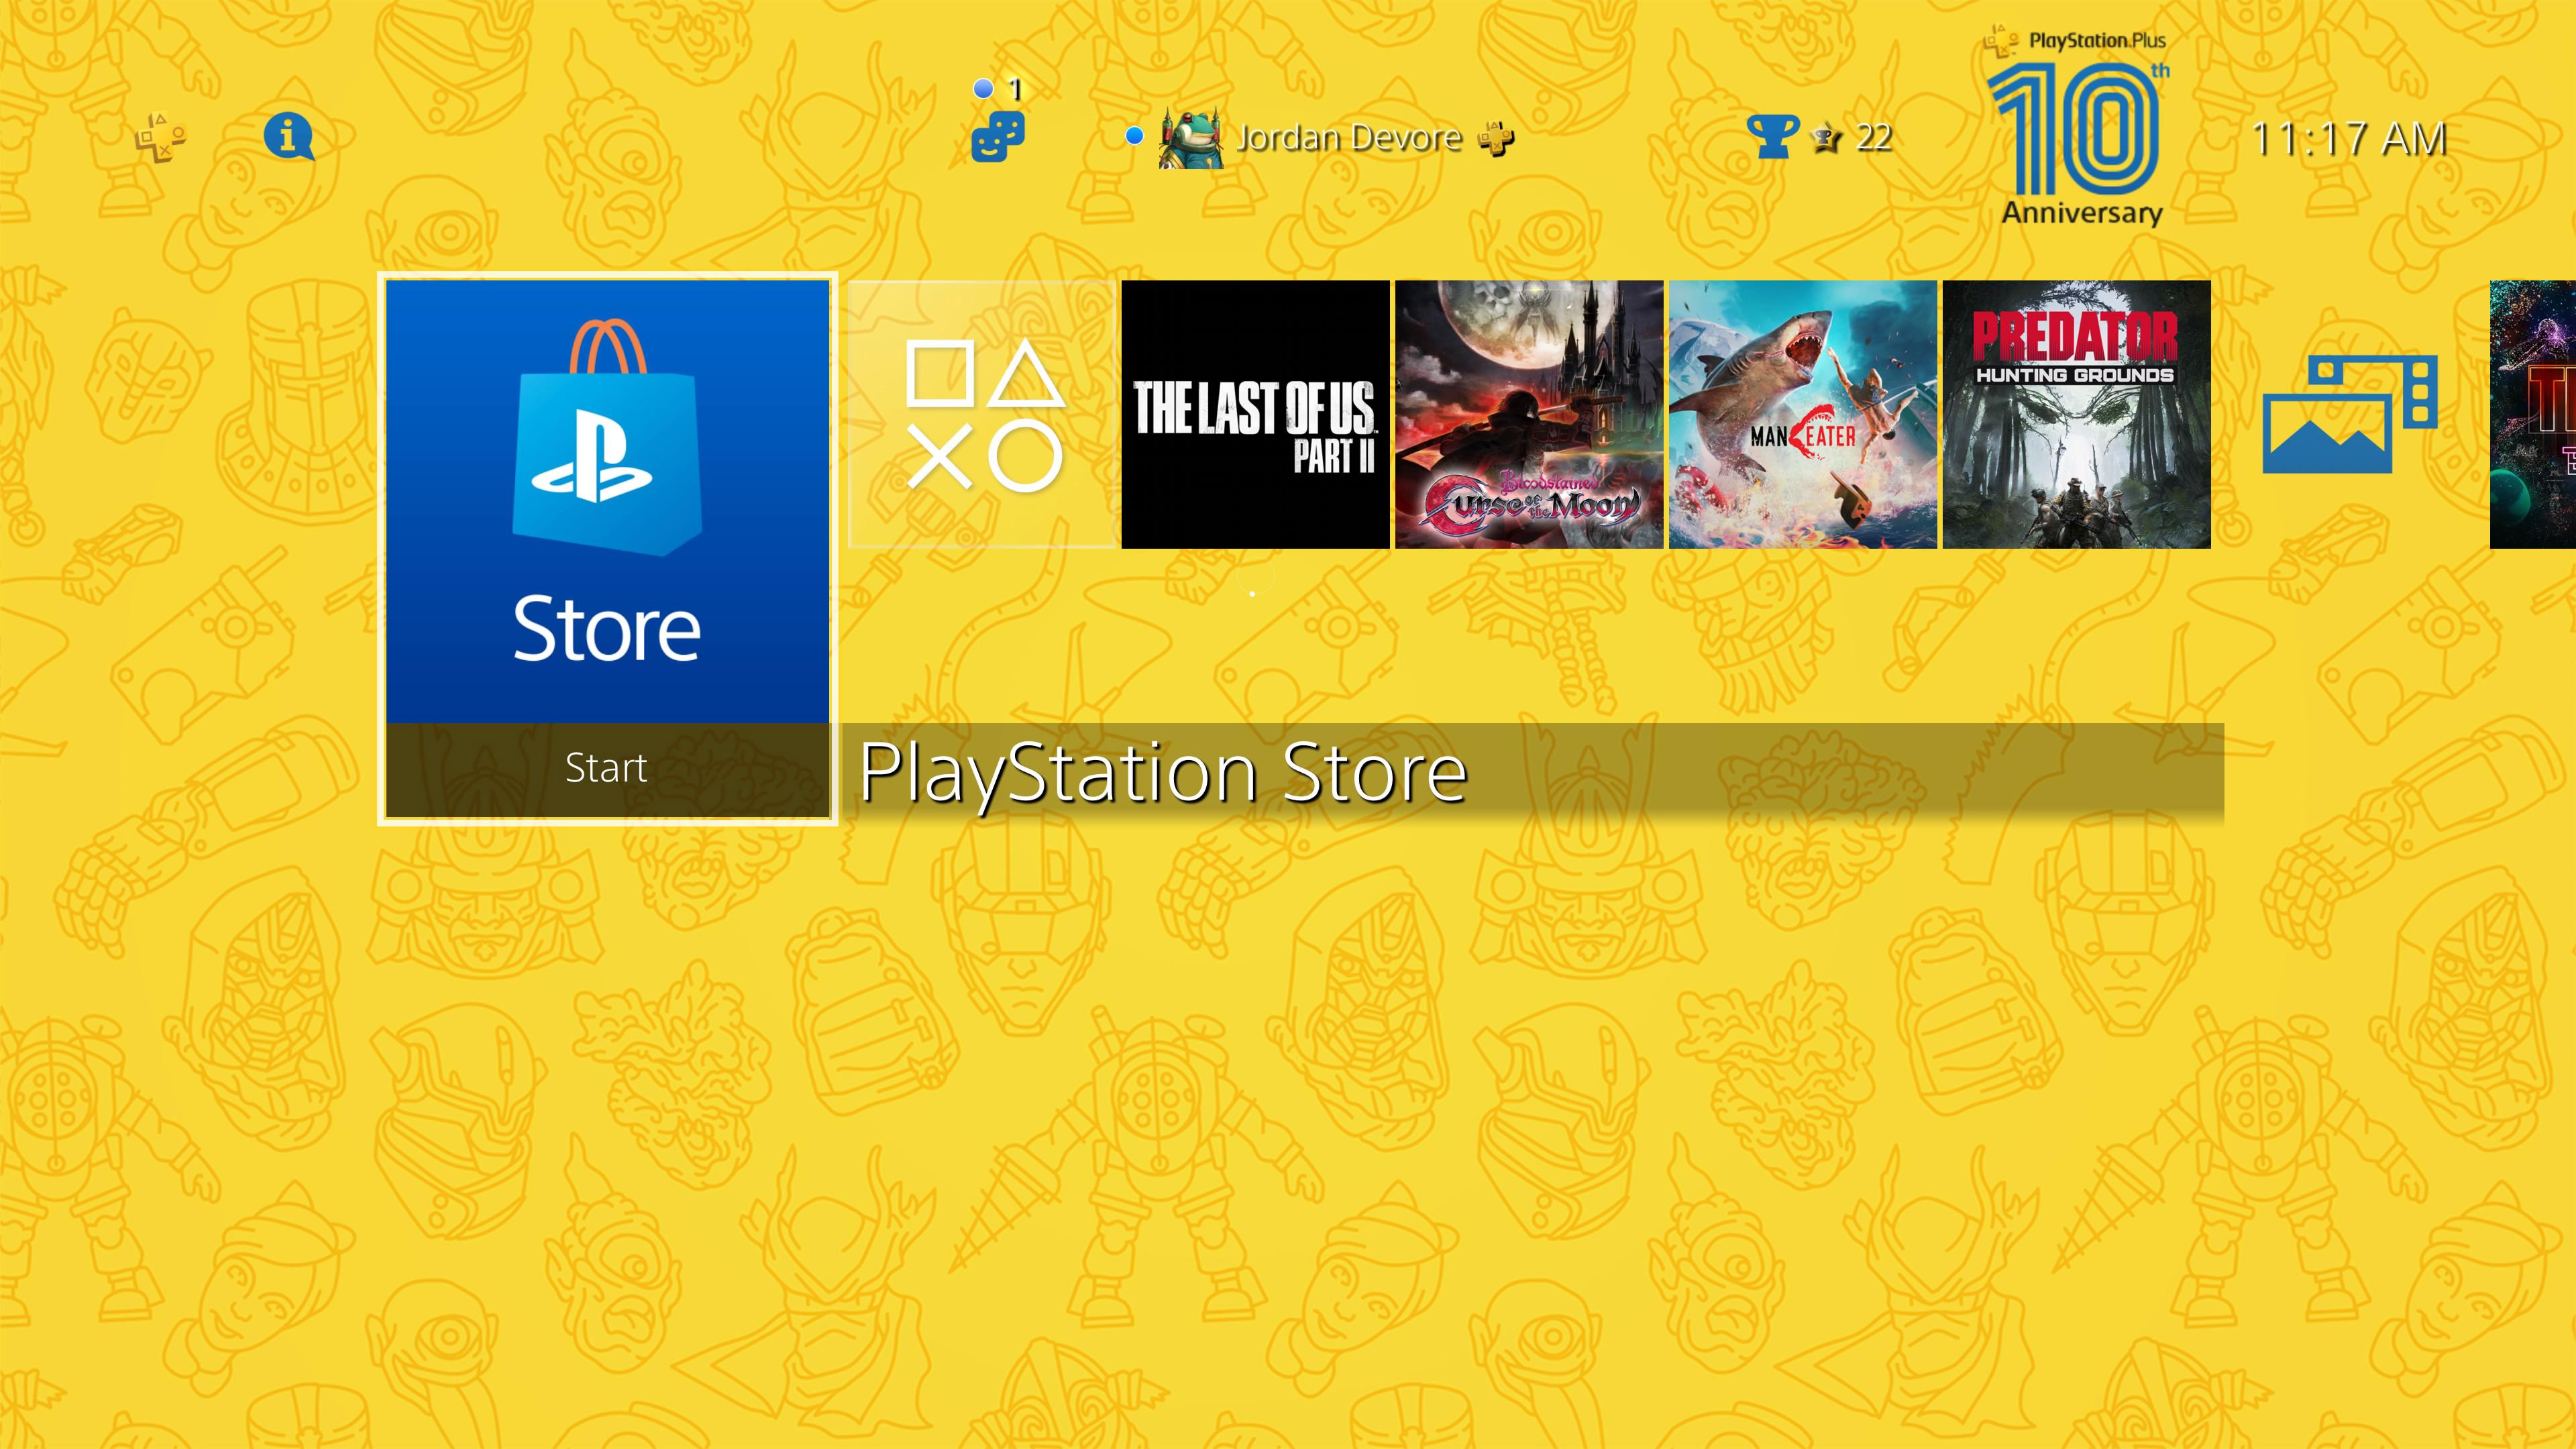 PlayStation Plus 10th Anniversary theme